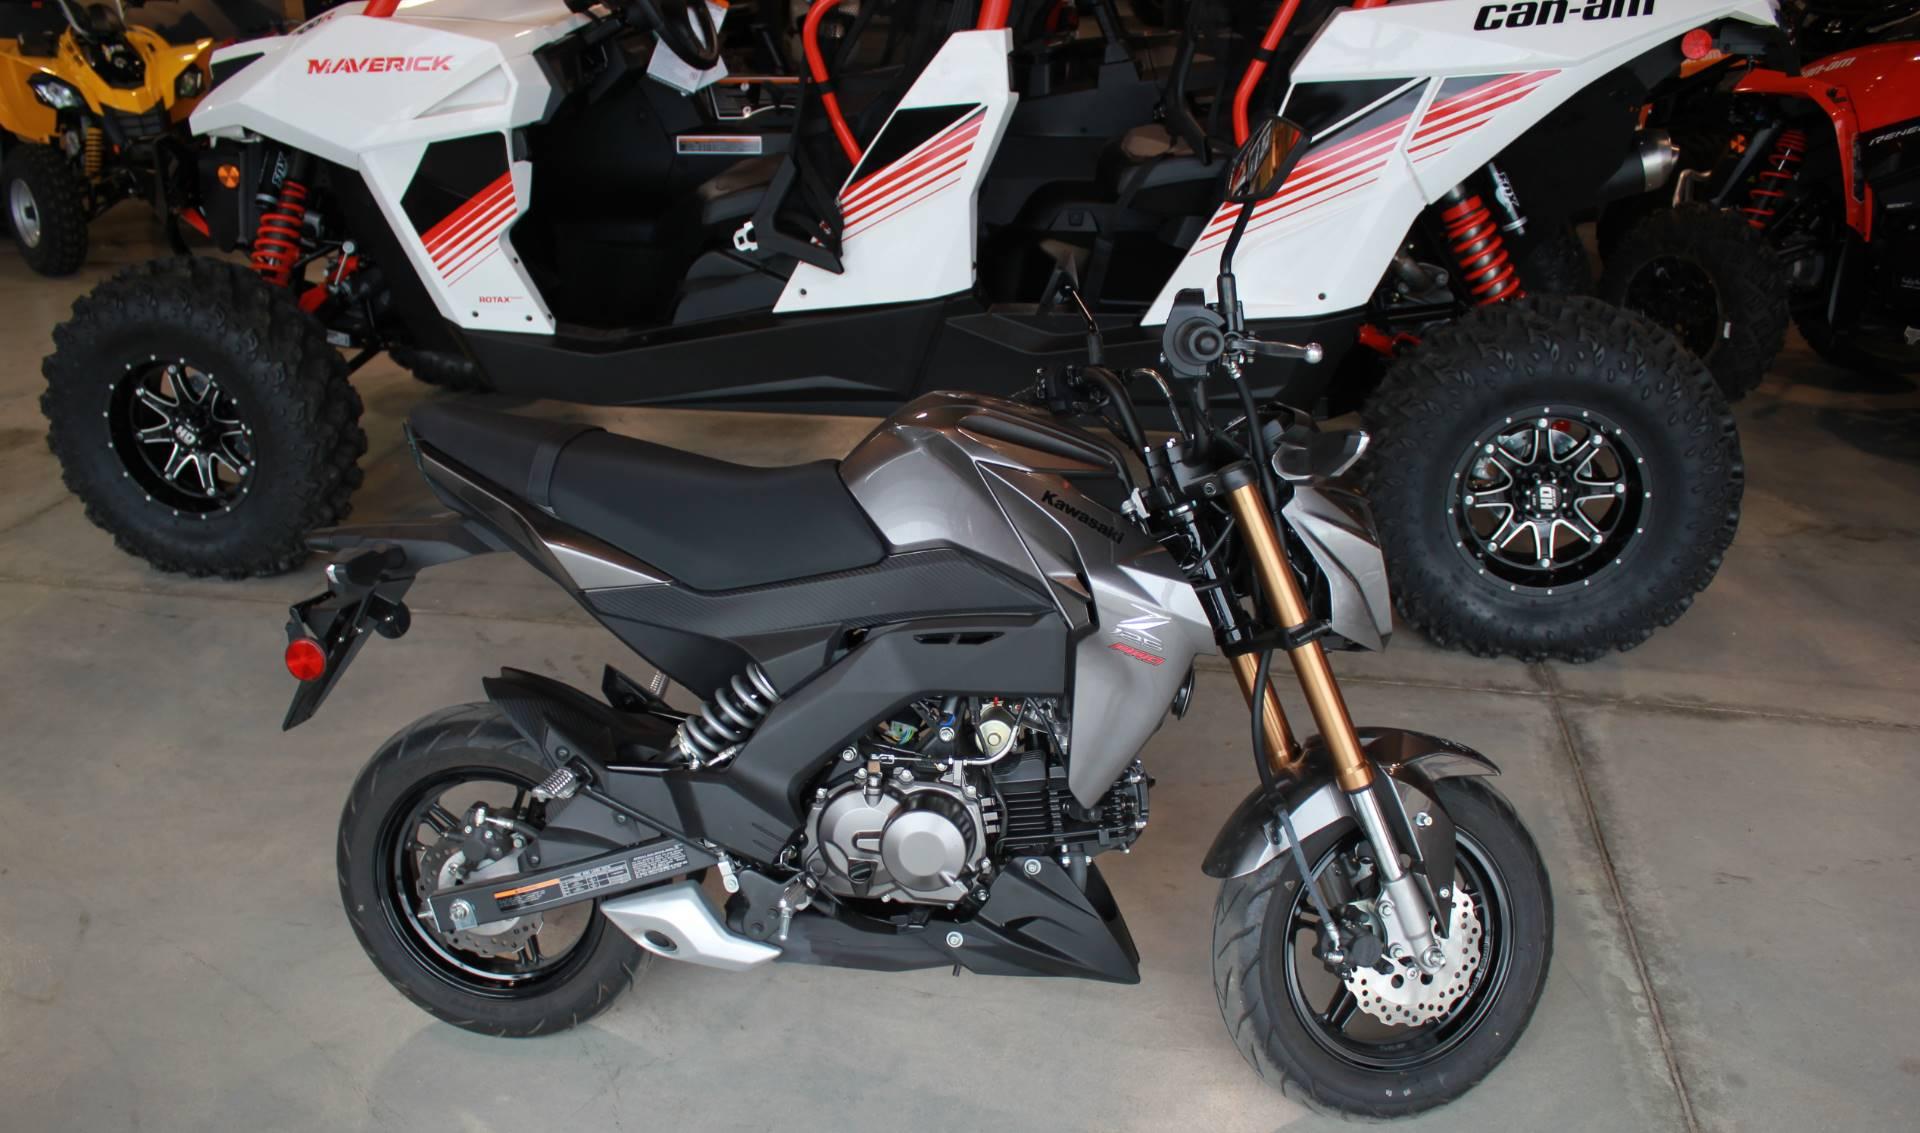 2017 Kawasaki Z125 Pro >> Used 2017 Kawasaki Z125 Pro Motorcycles In Batavia Oh Stock